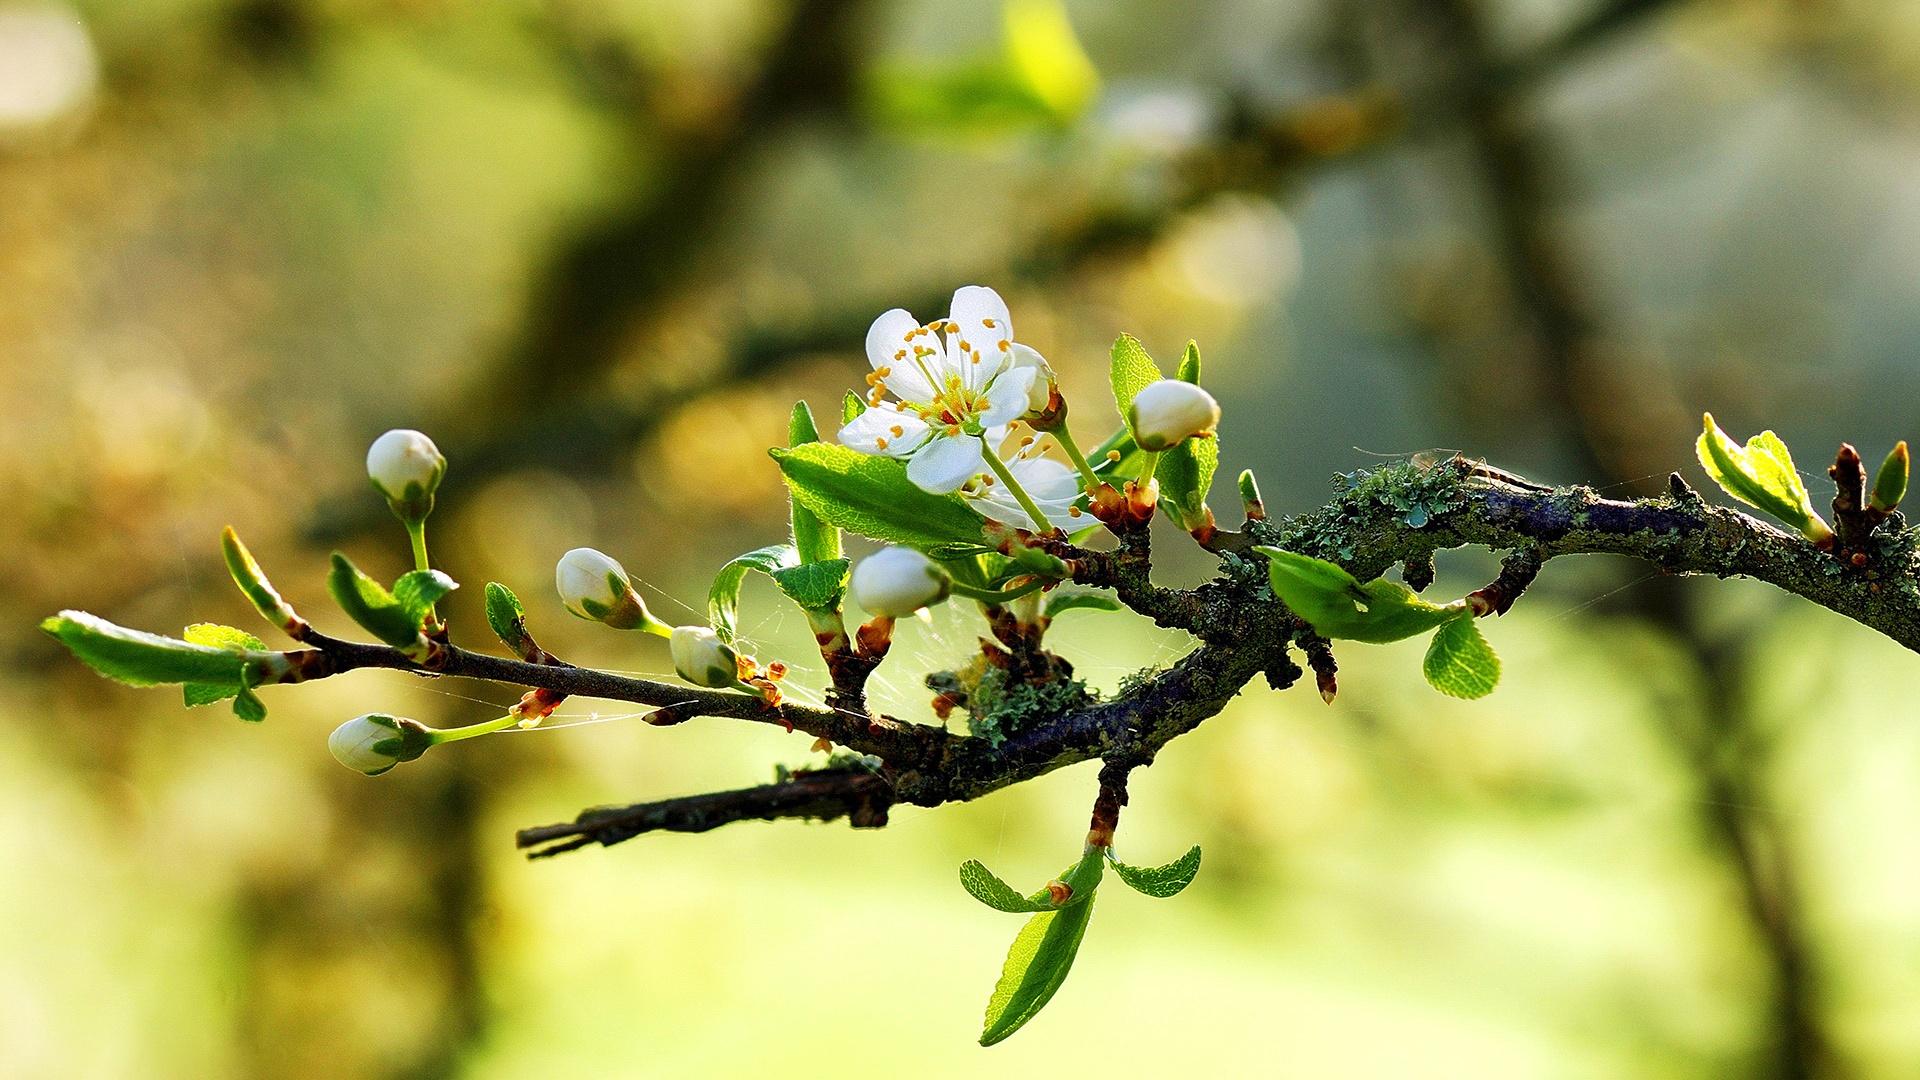 springtime hd